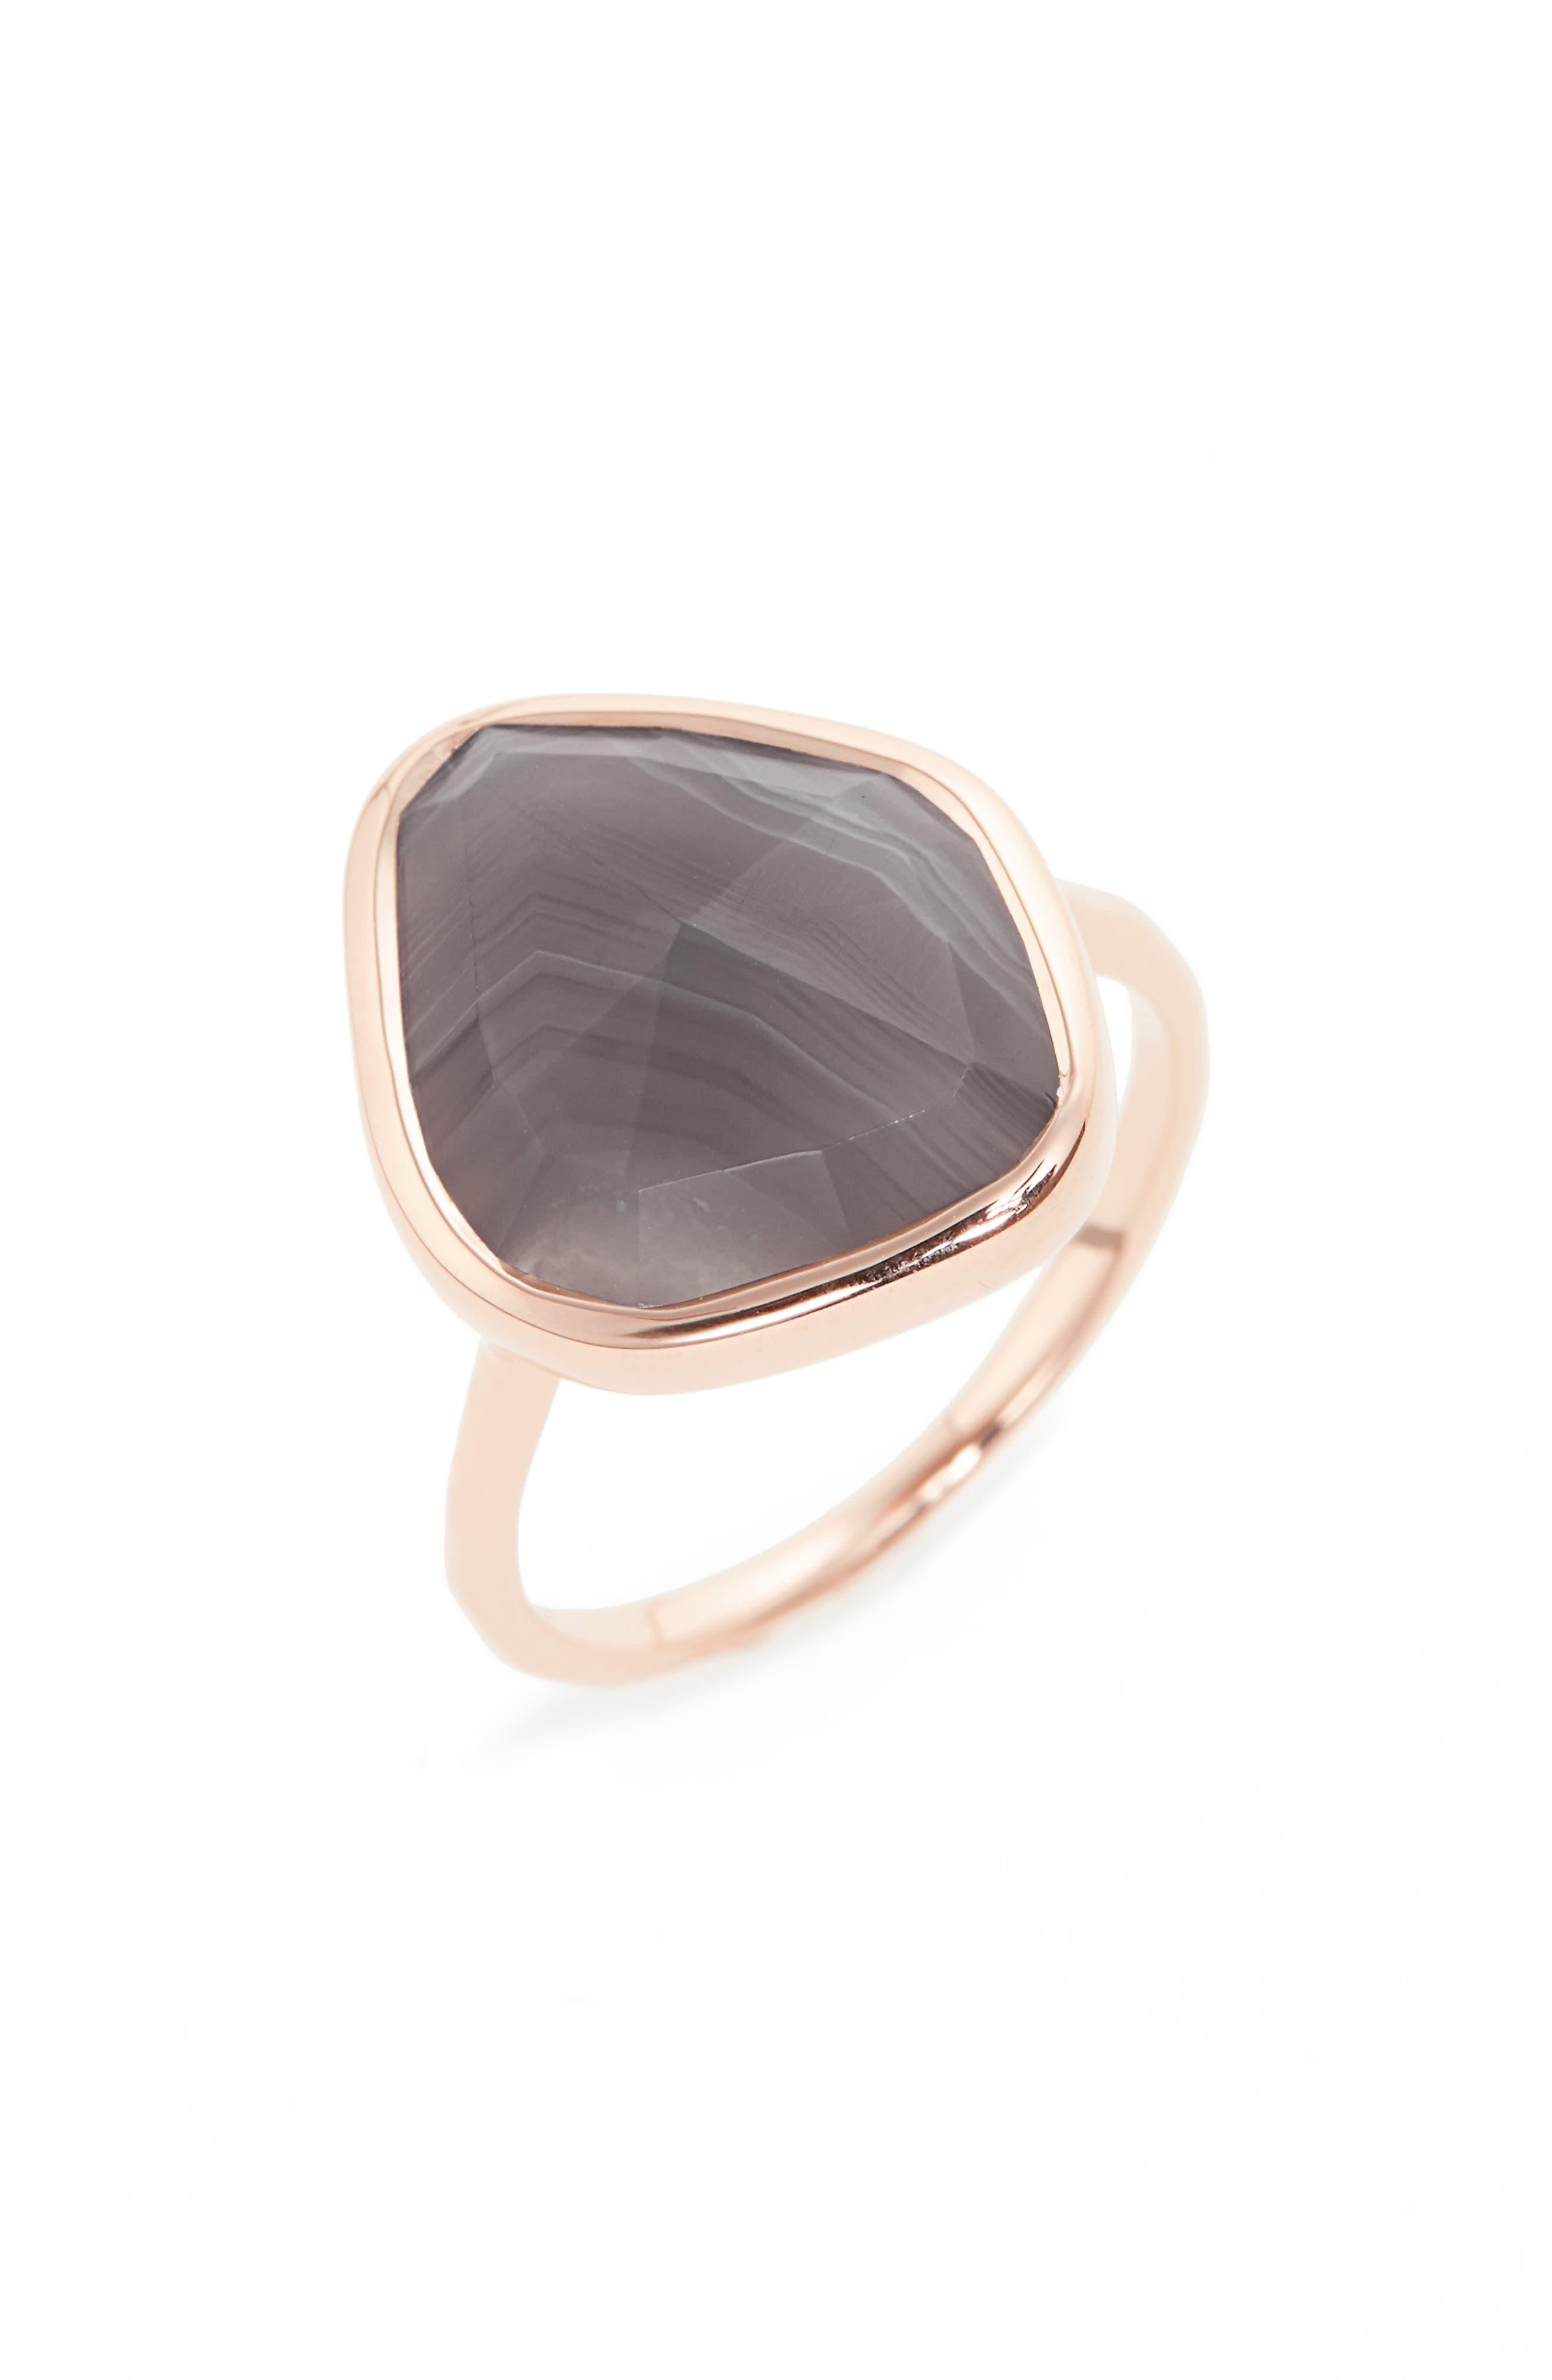 Siren Nugget Semiprecious Stone Ring,                         Main,                         color, Rose Gold/ Grey Agate